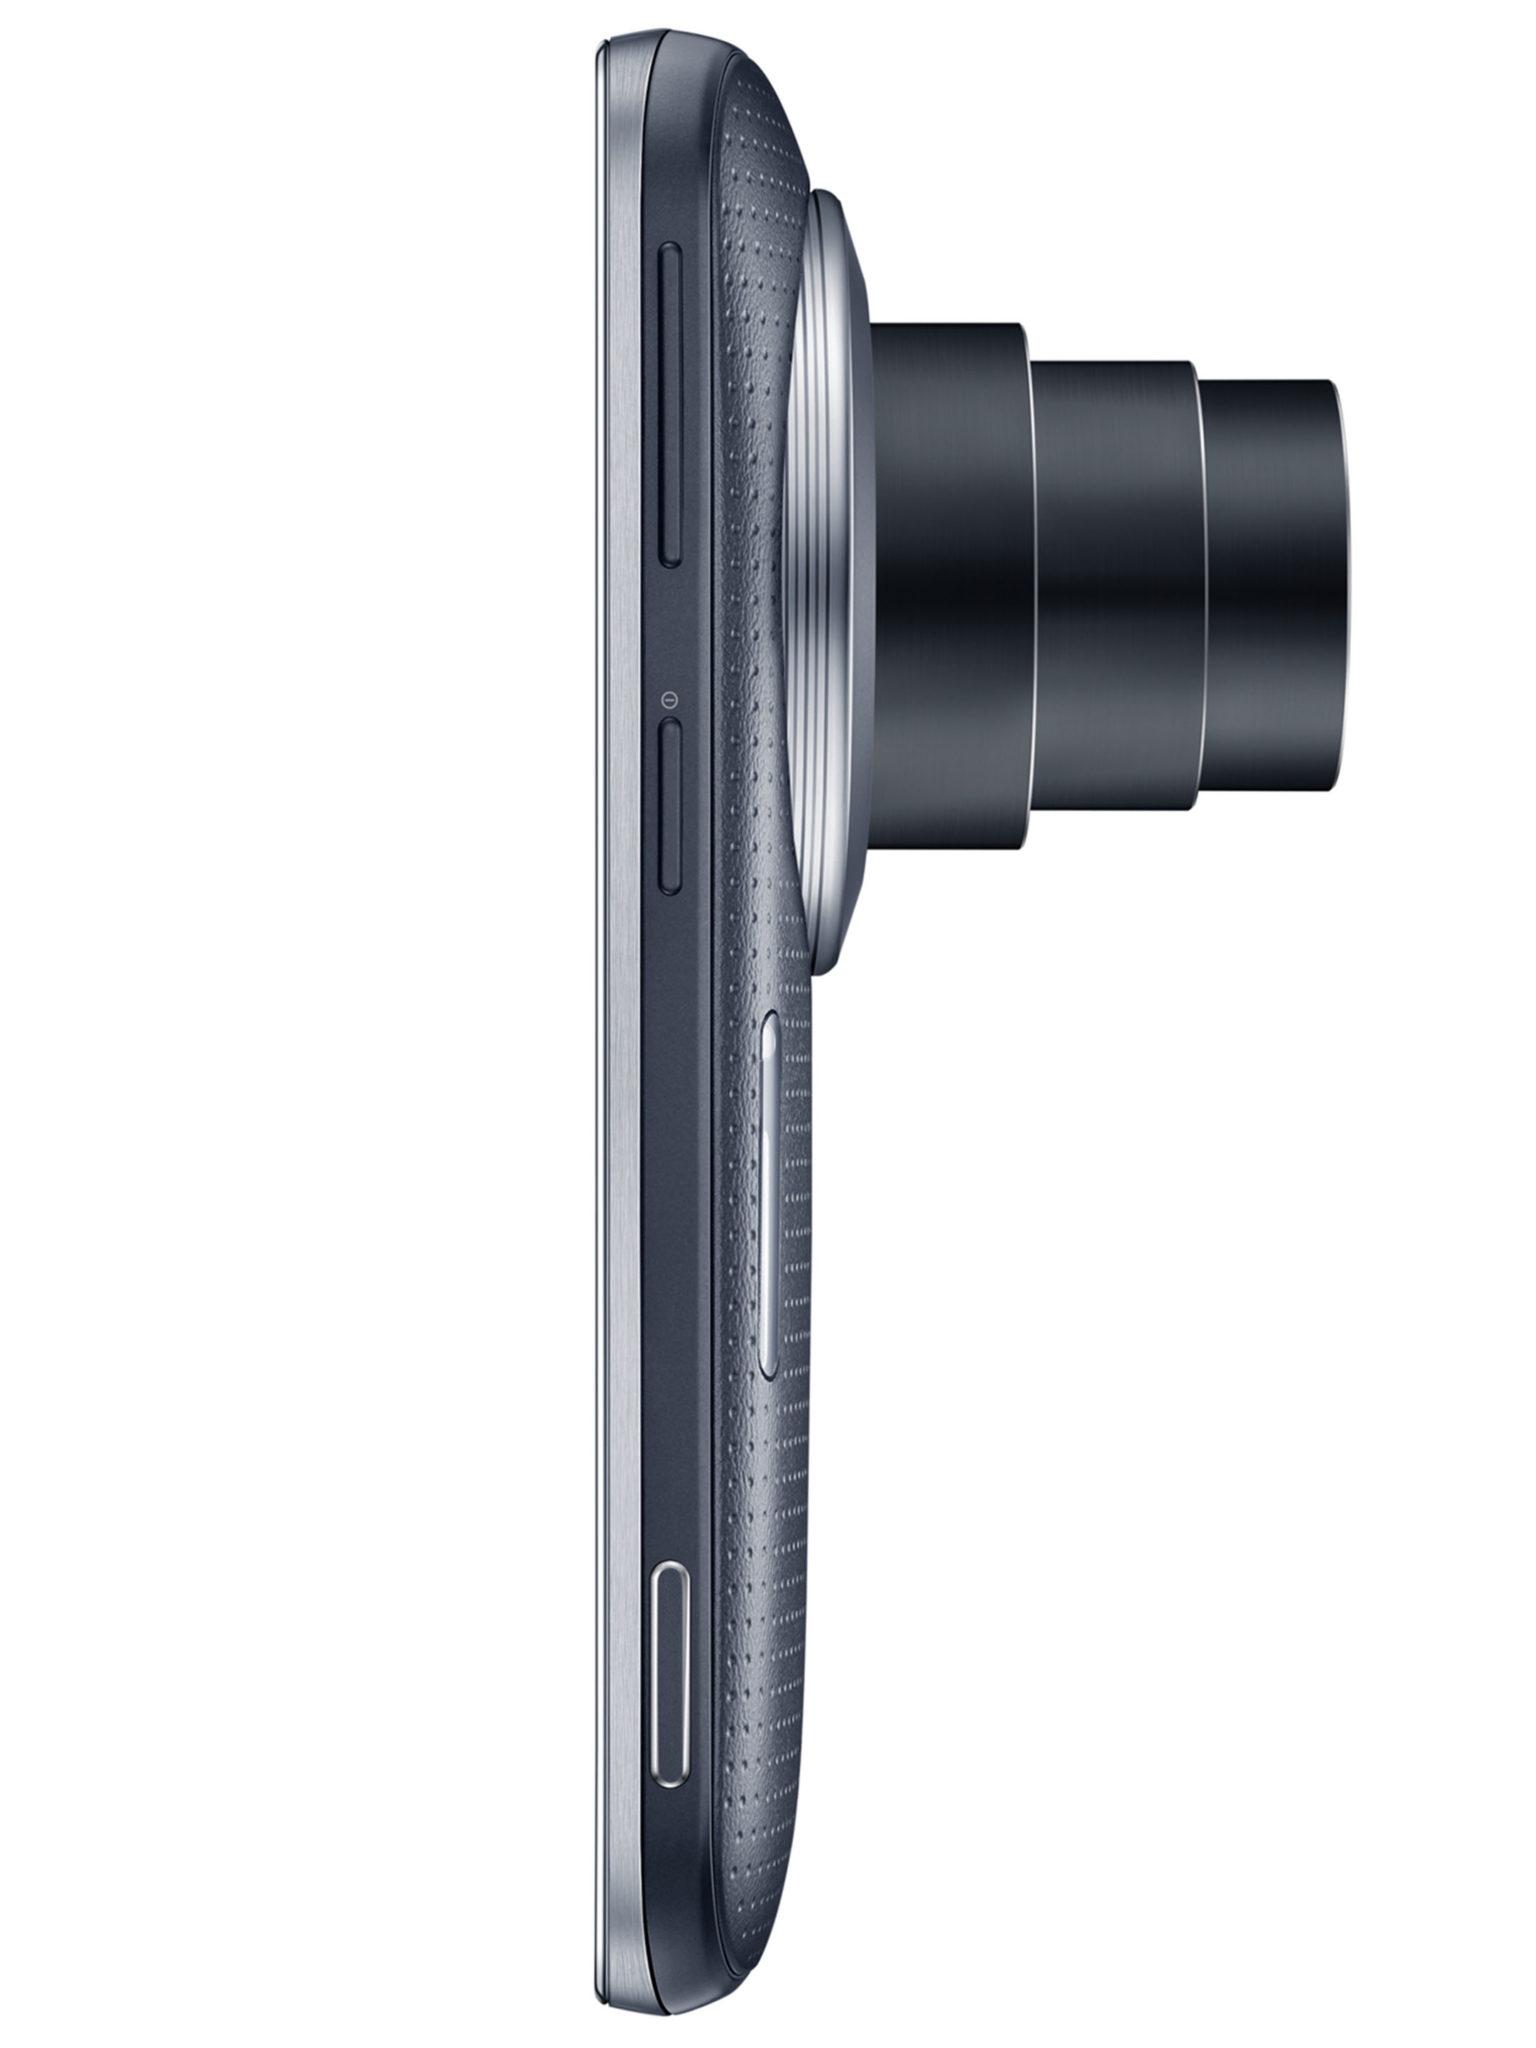 Samsung Galaxy K Zoom Telcel (2)